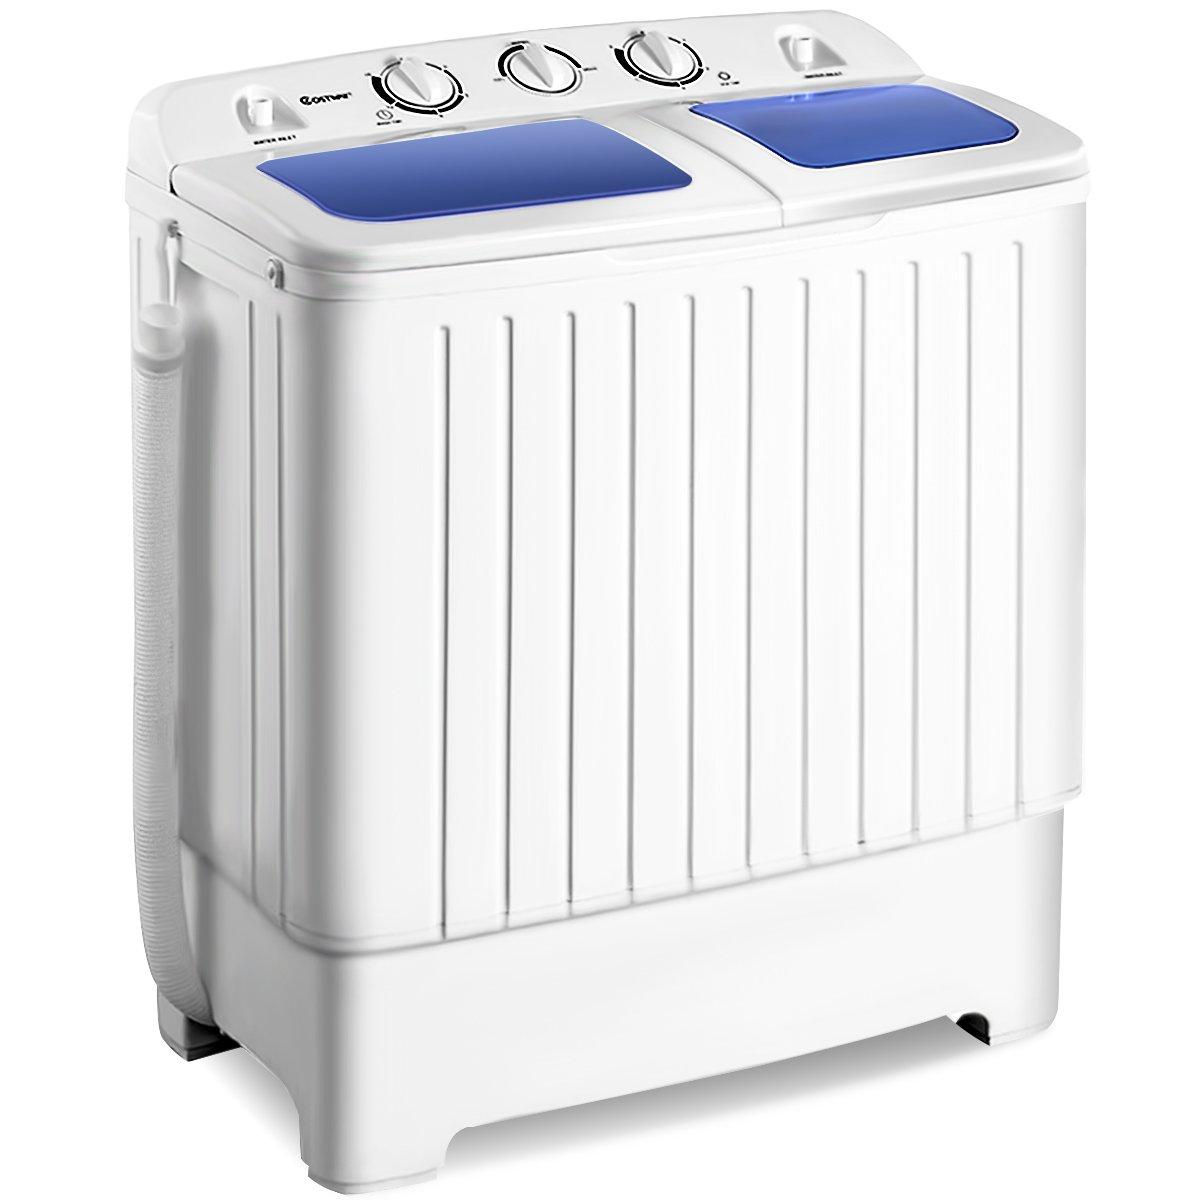 COSTWAY Mini Twin Tub Washing Machine